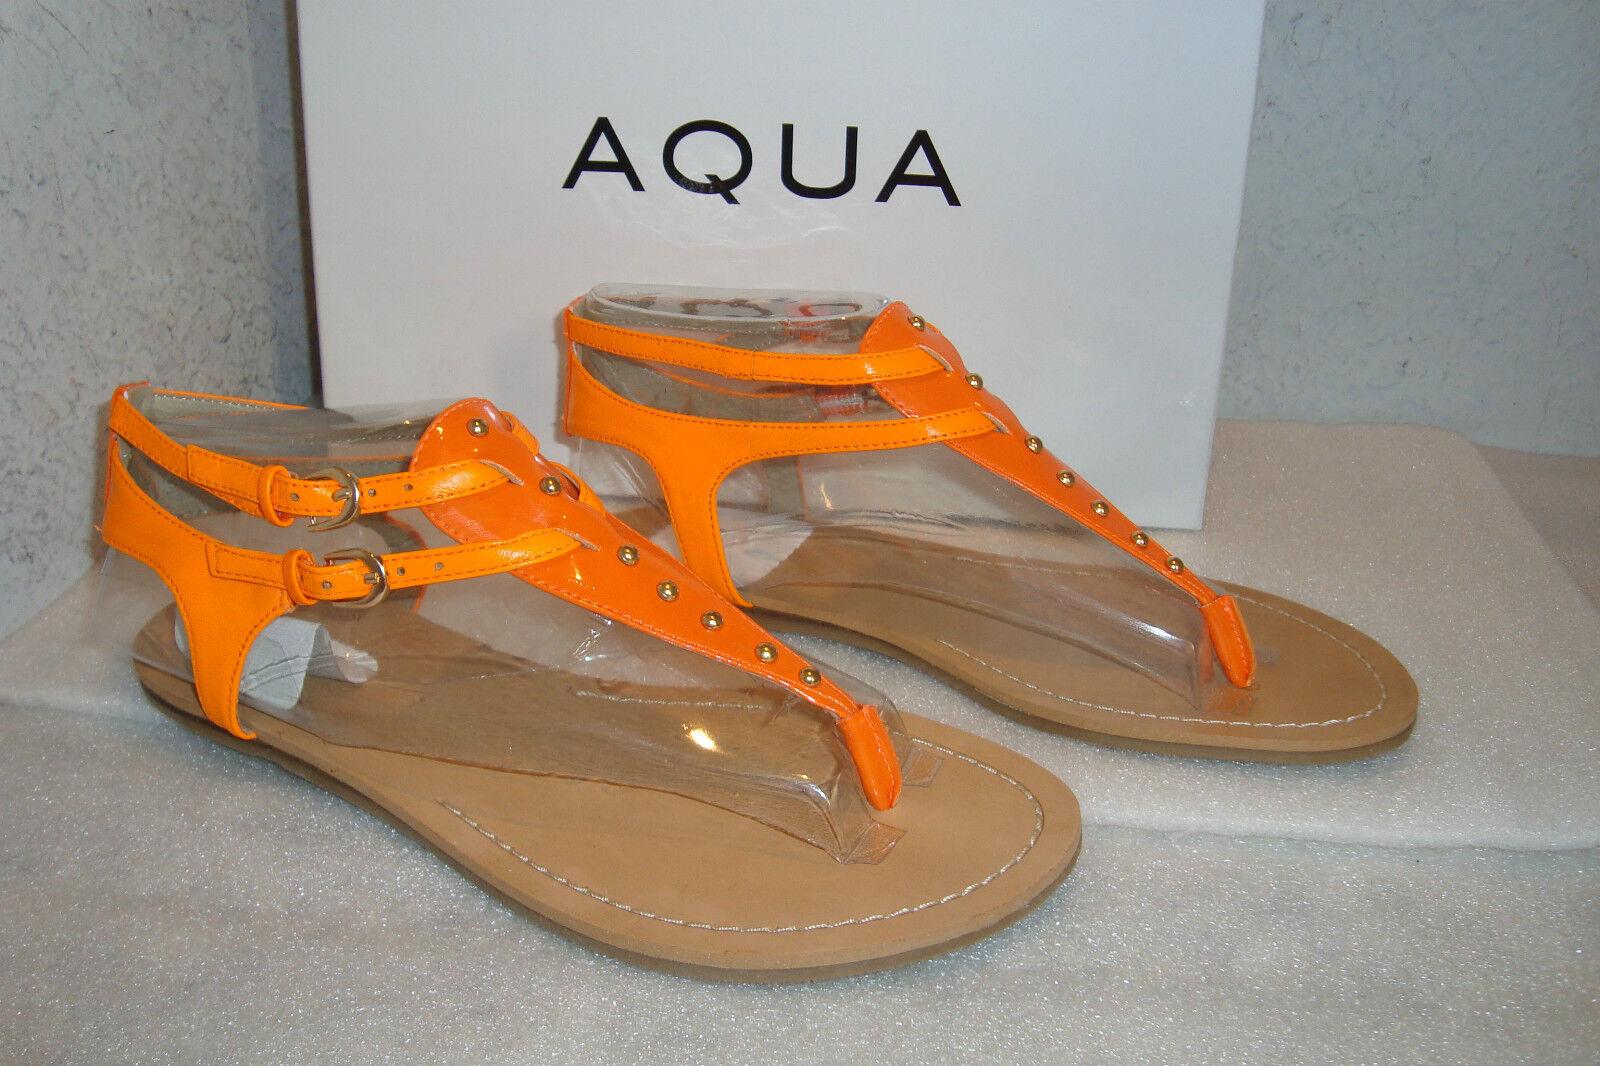 Aqua Womens NWB Famous orange Leather Sandals shoes 6.5 MED NEW